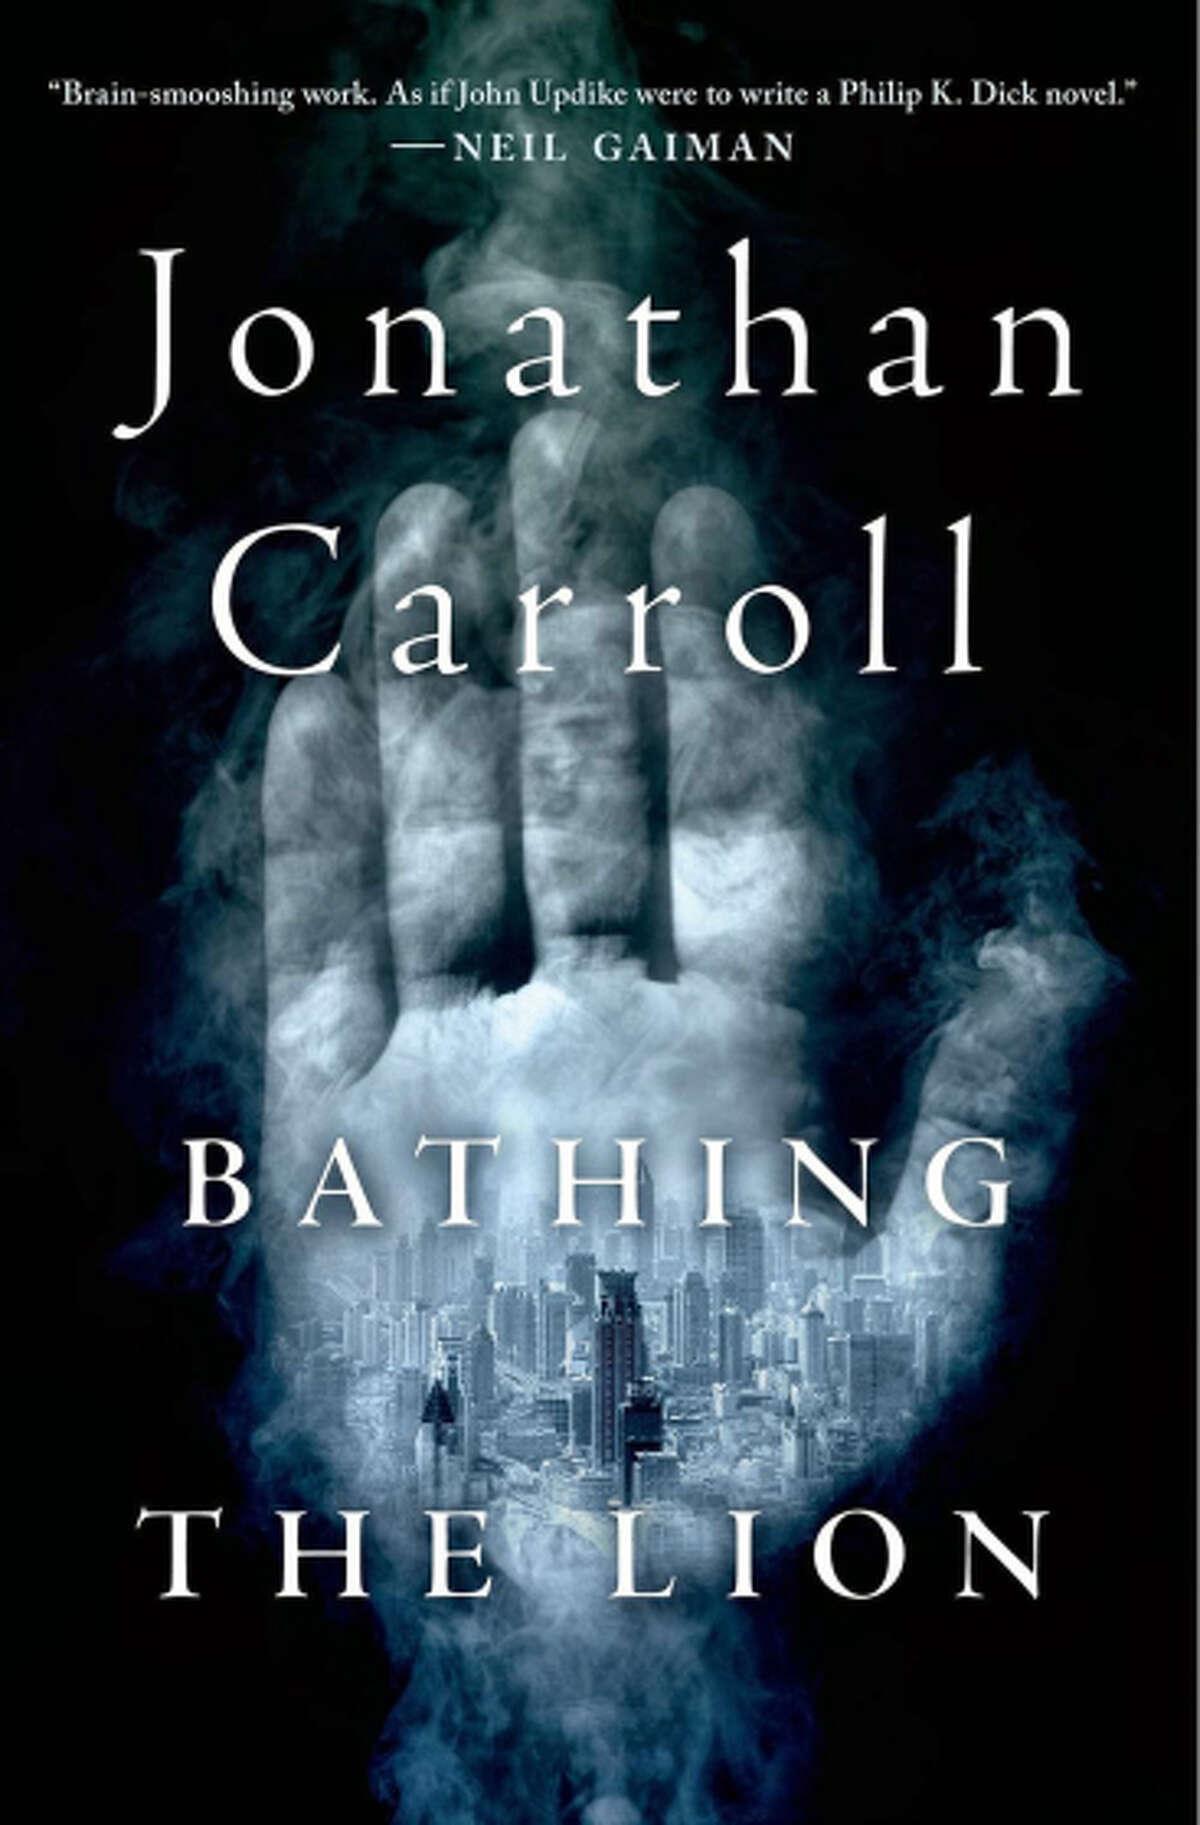 """Bathing the Lion,"" by Jonathan Carroll"